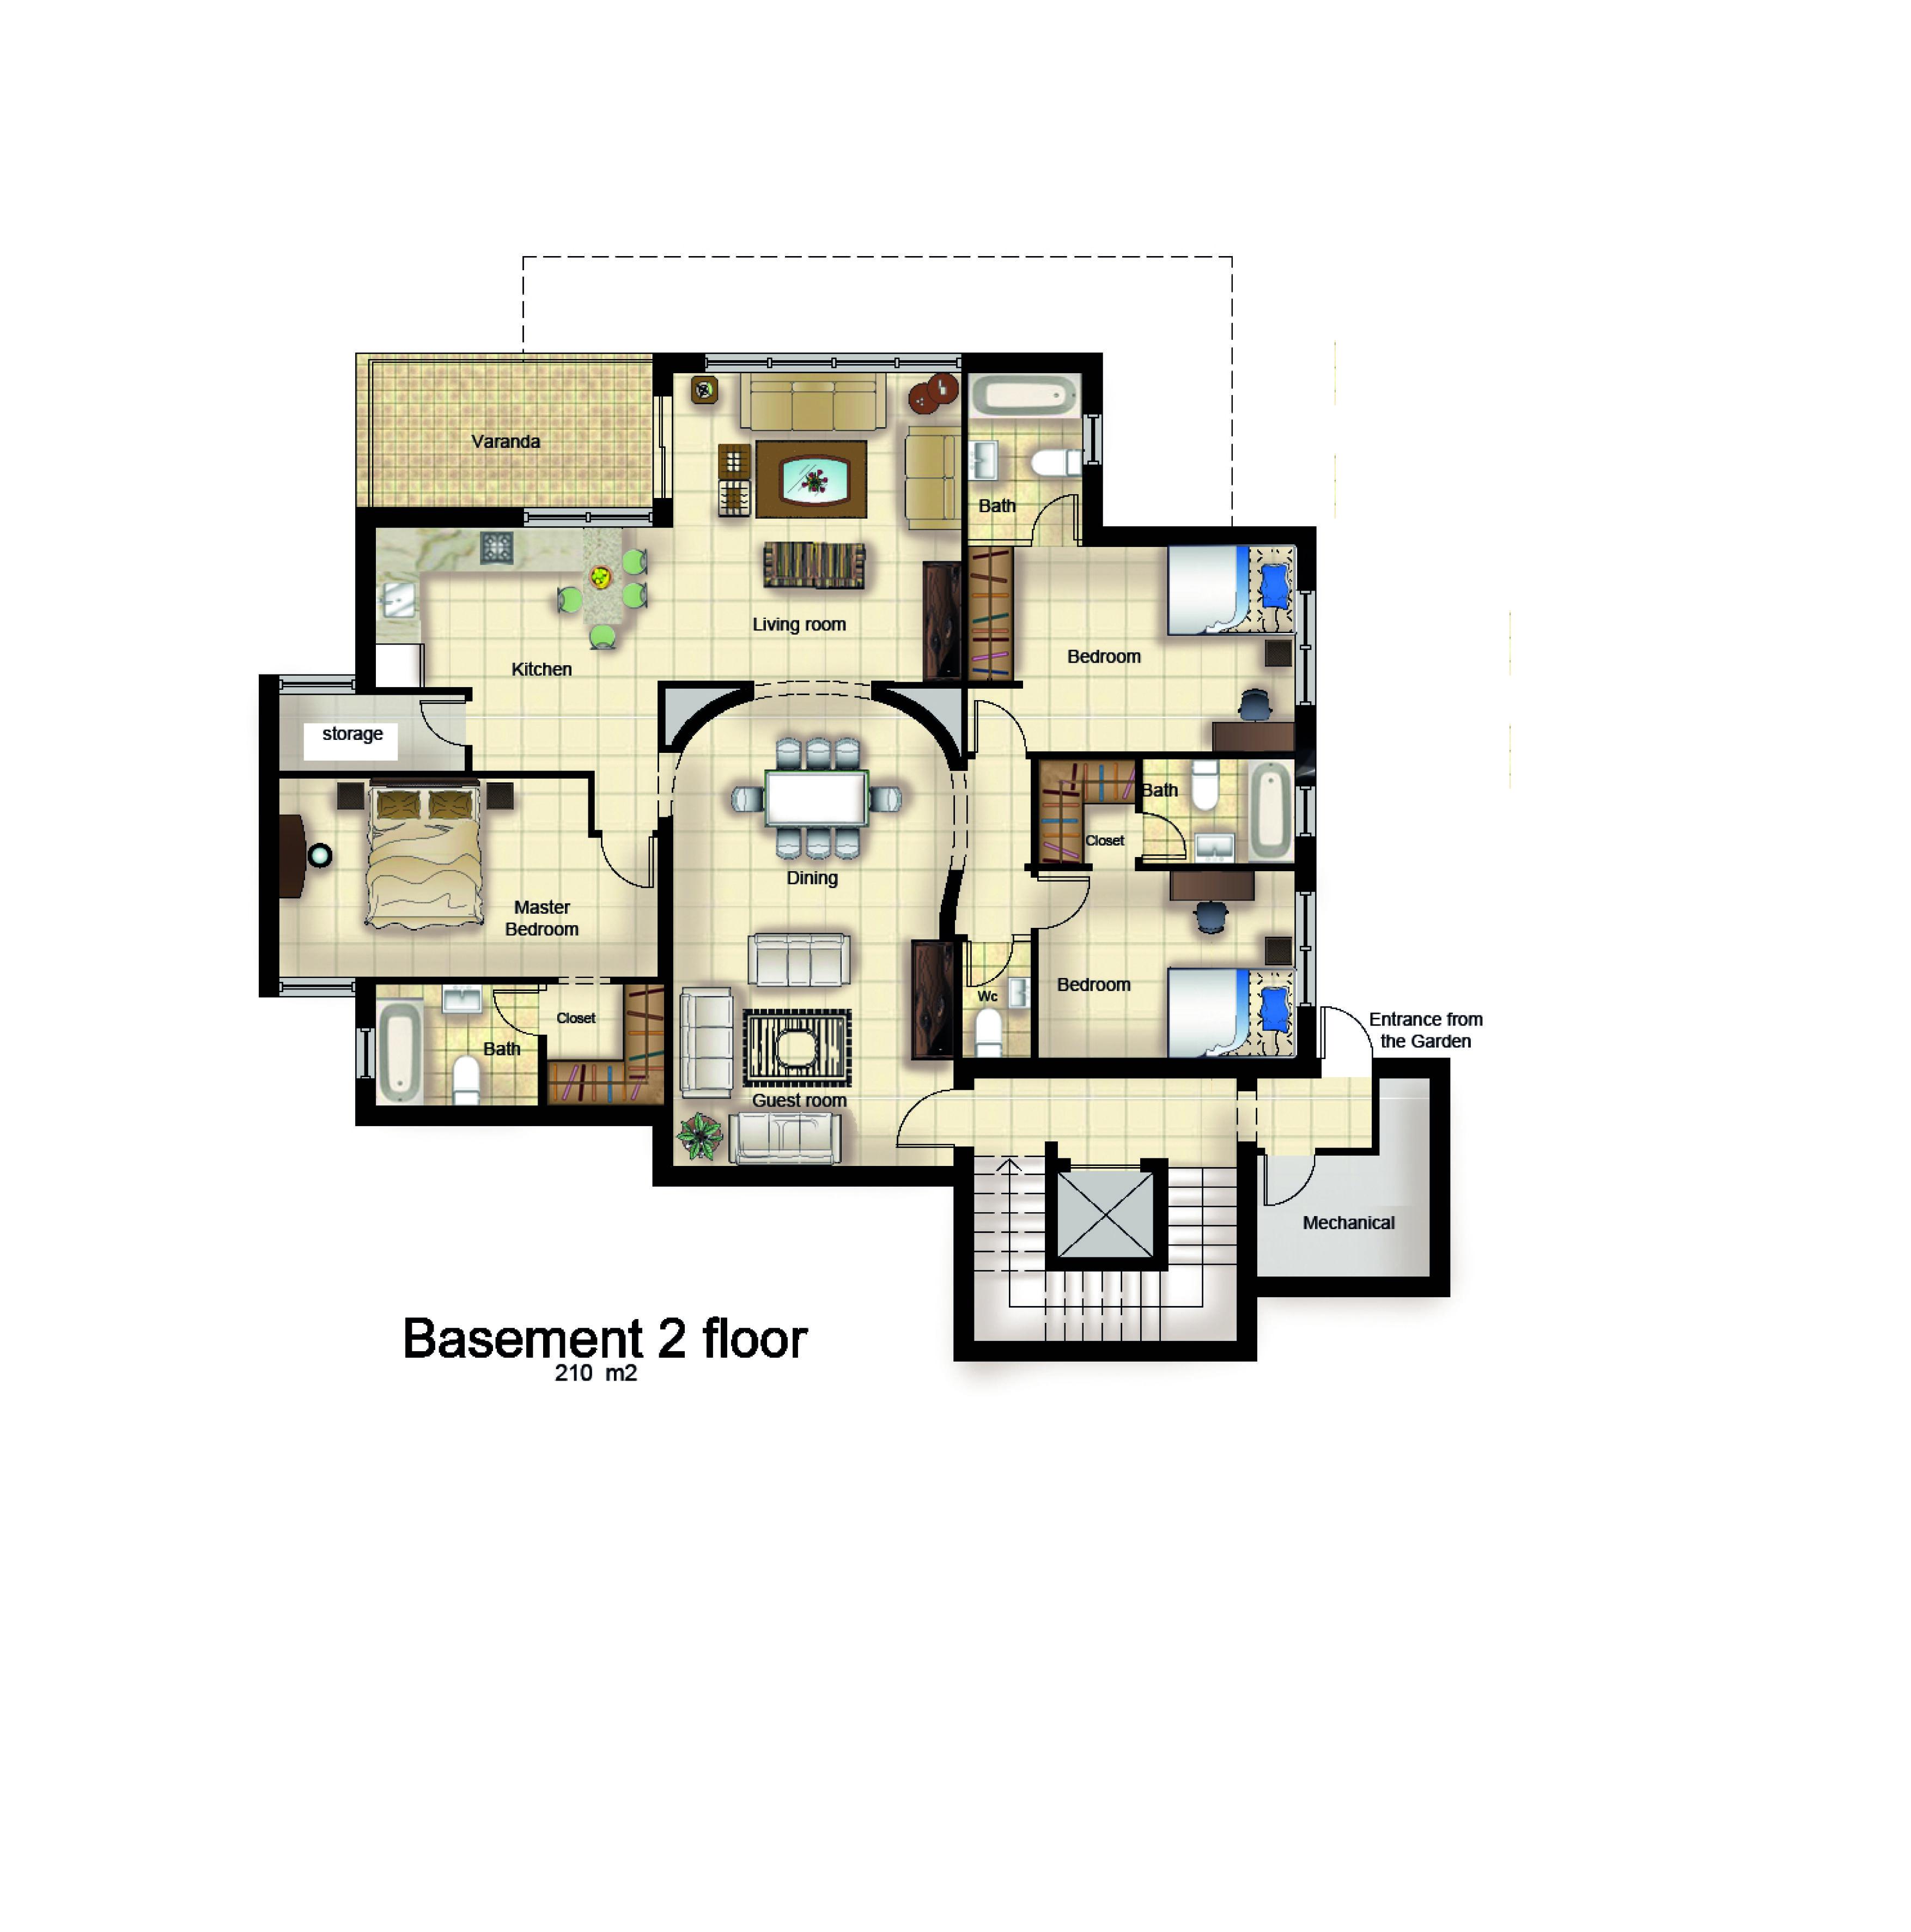 Villa Abu Qash Second Basement Plan My Work In Assia Engineering Office Basement Plans Dining Storage Living Storage